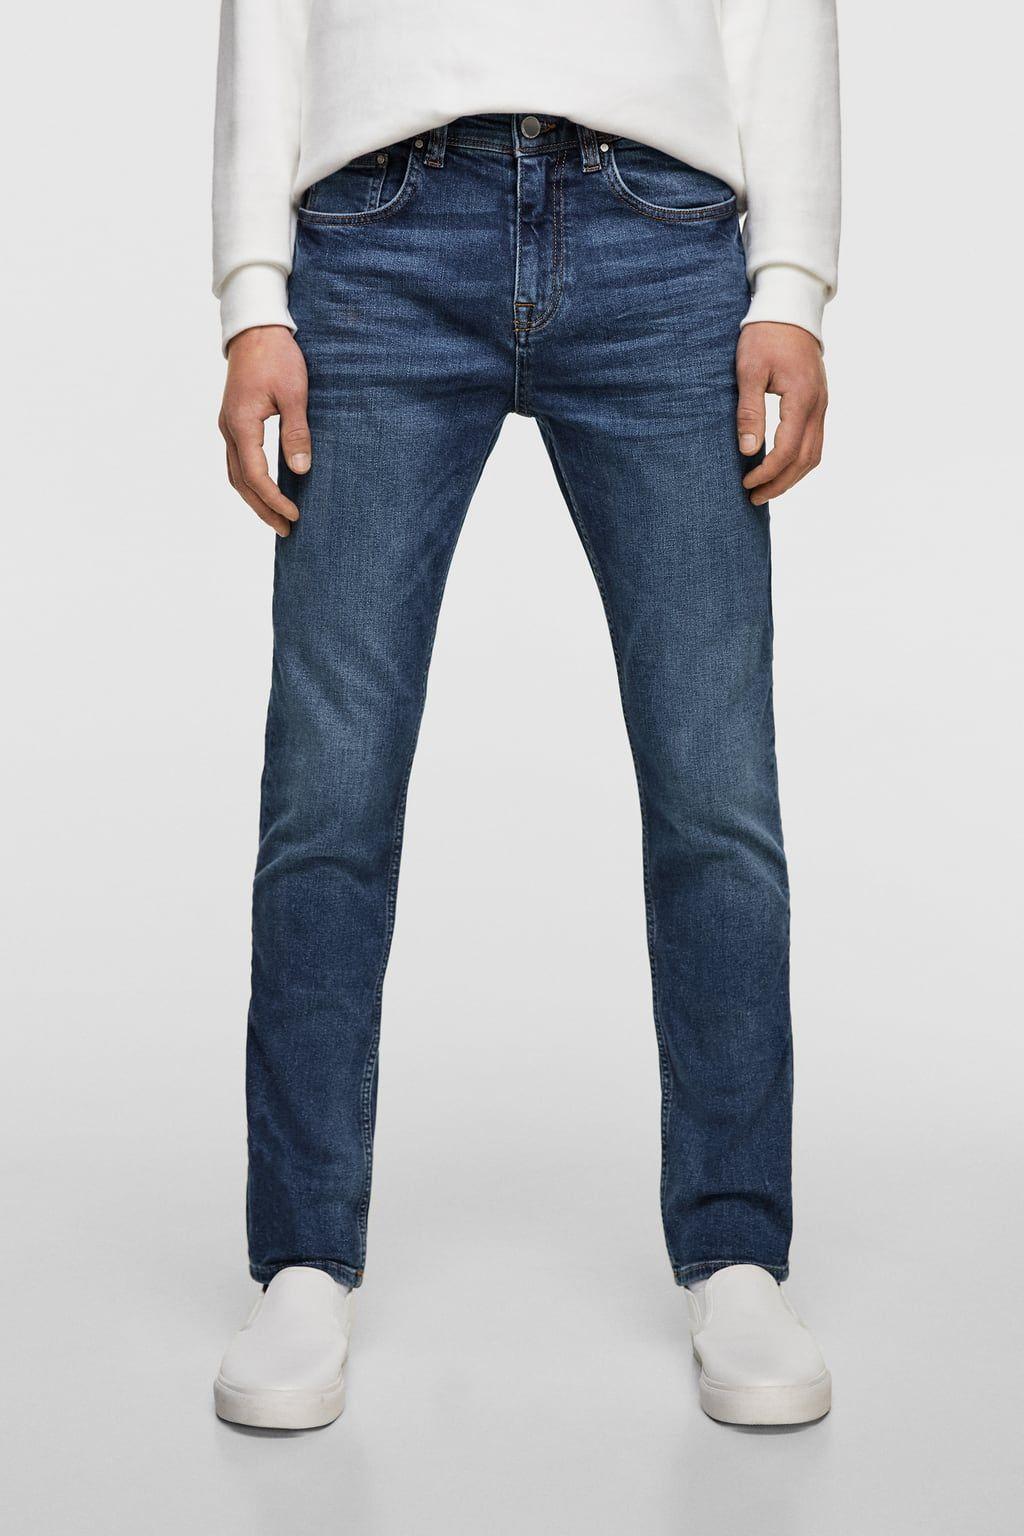 NUOVO H/&M skinny slim fit caviglia jeans lavato stretch denim vita regolare